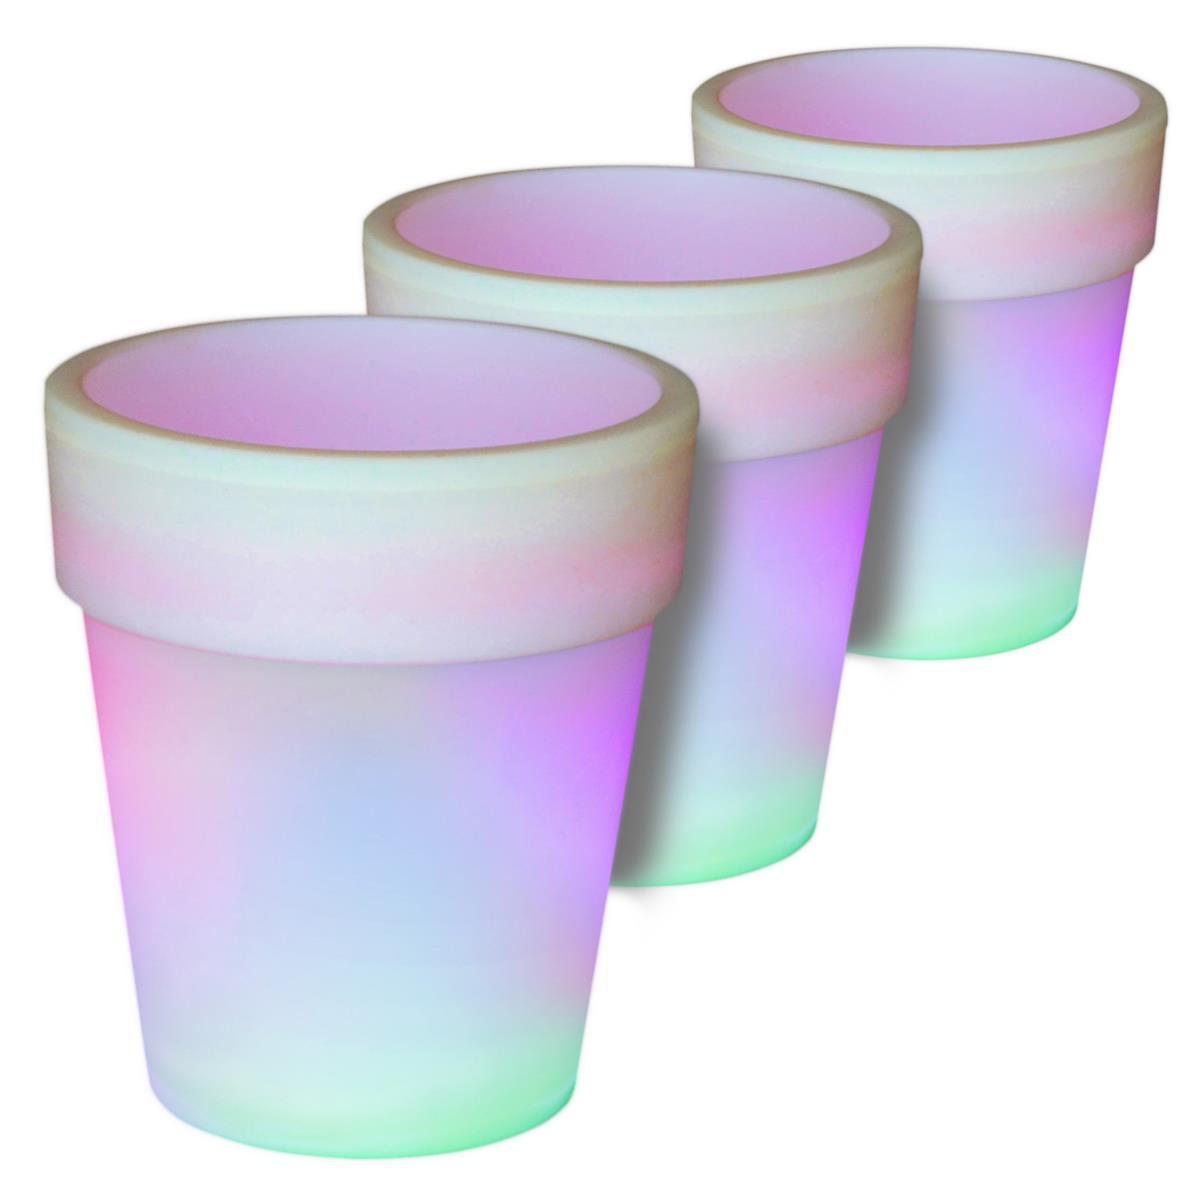 3er Set LED Solar Blumentopf weiß 3 LED mit Farbwechsel 19x17 cm Pflanzkübel